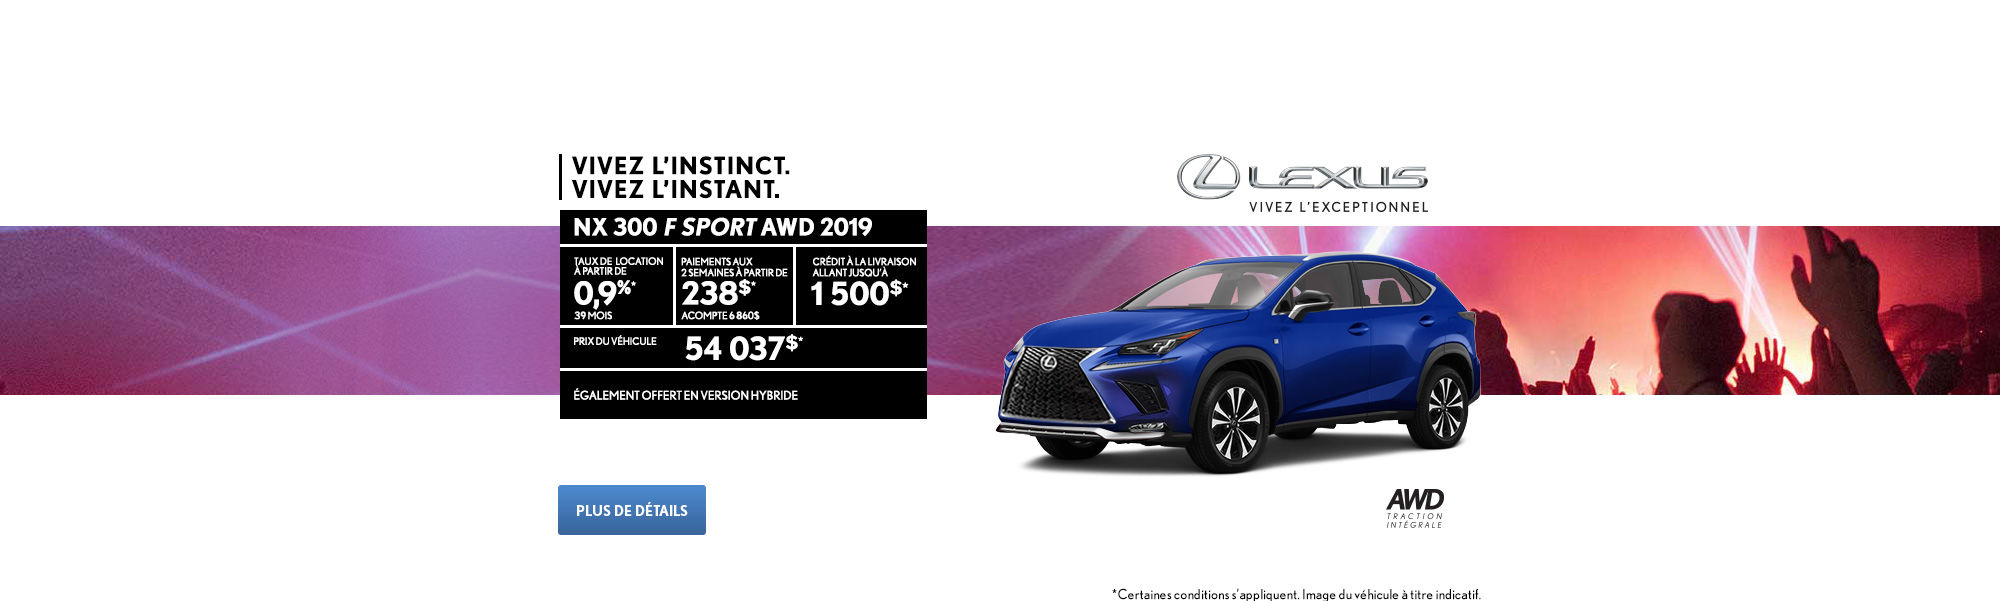 Lexus NX Sport 300 2019